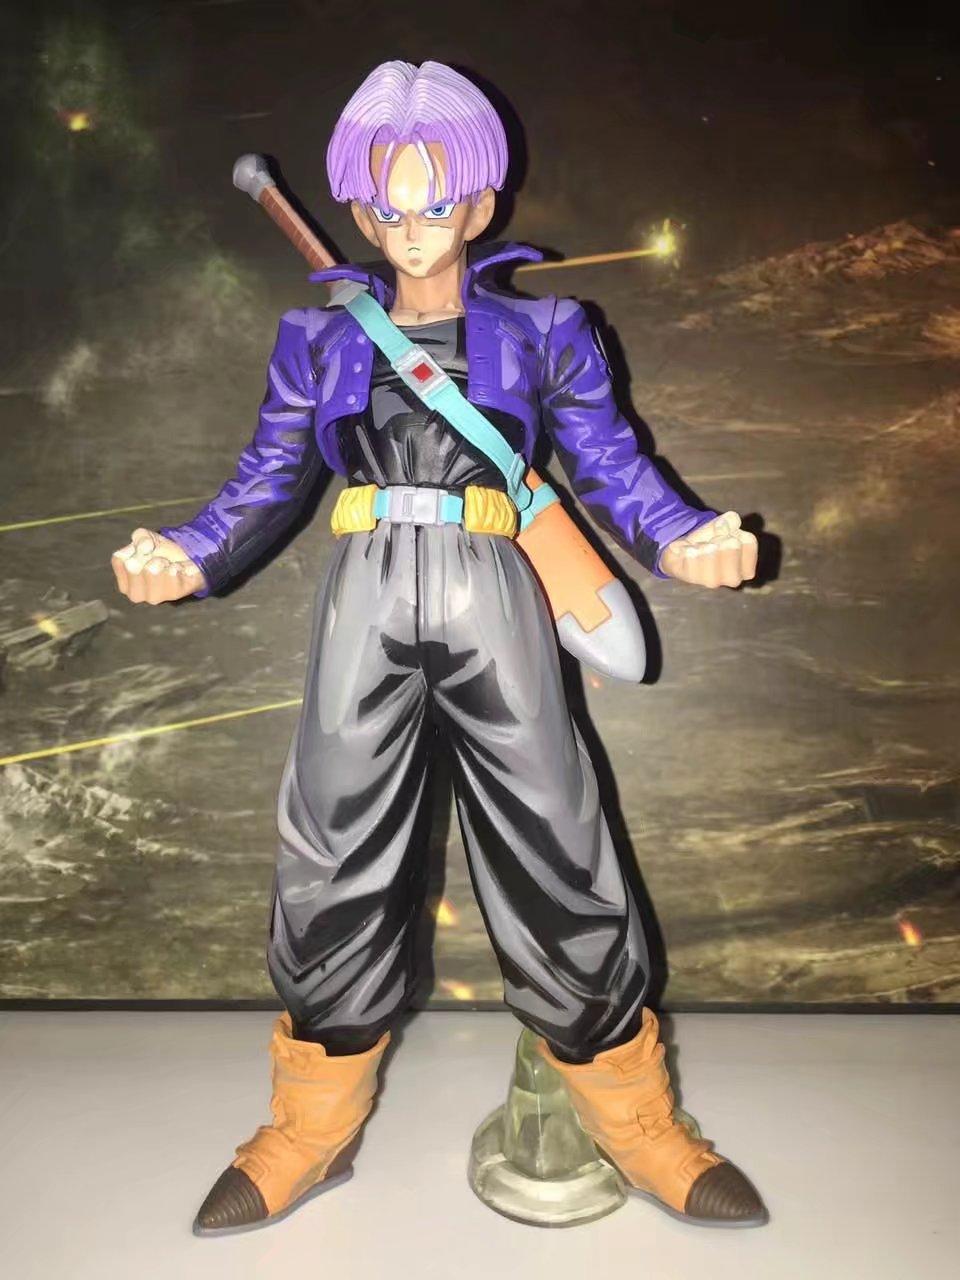 26CM original banpresto Trunks DRAGON BALL Z Figurine MSP figure pvc toy doll master stars piece